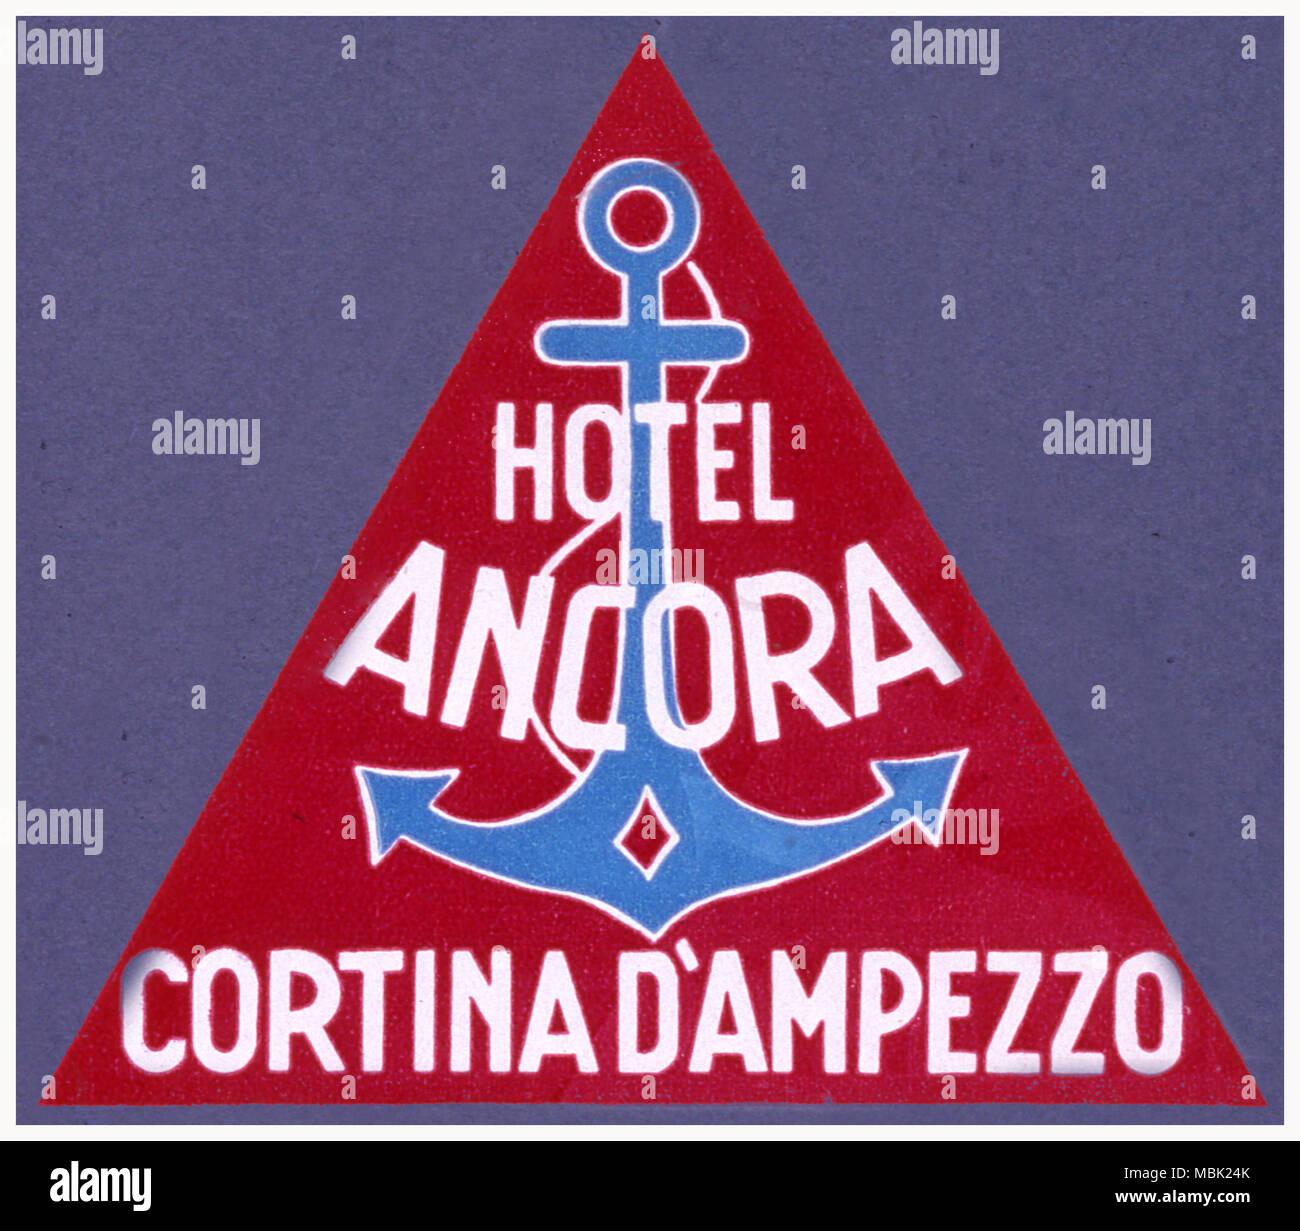 Hotel Ancora - Stock Image